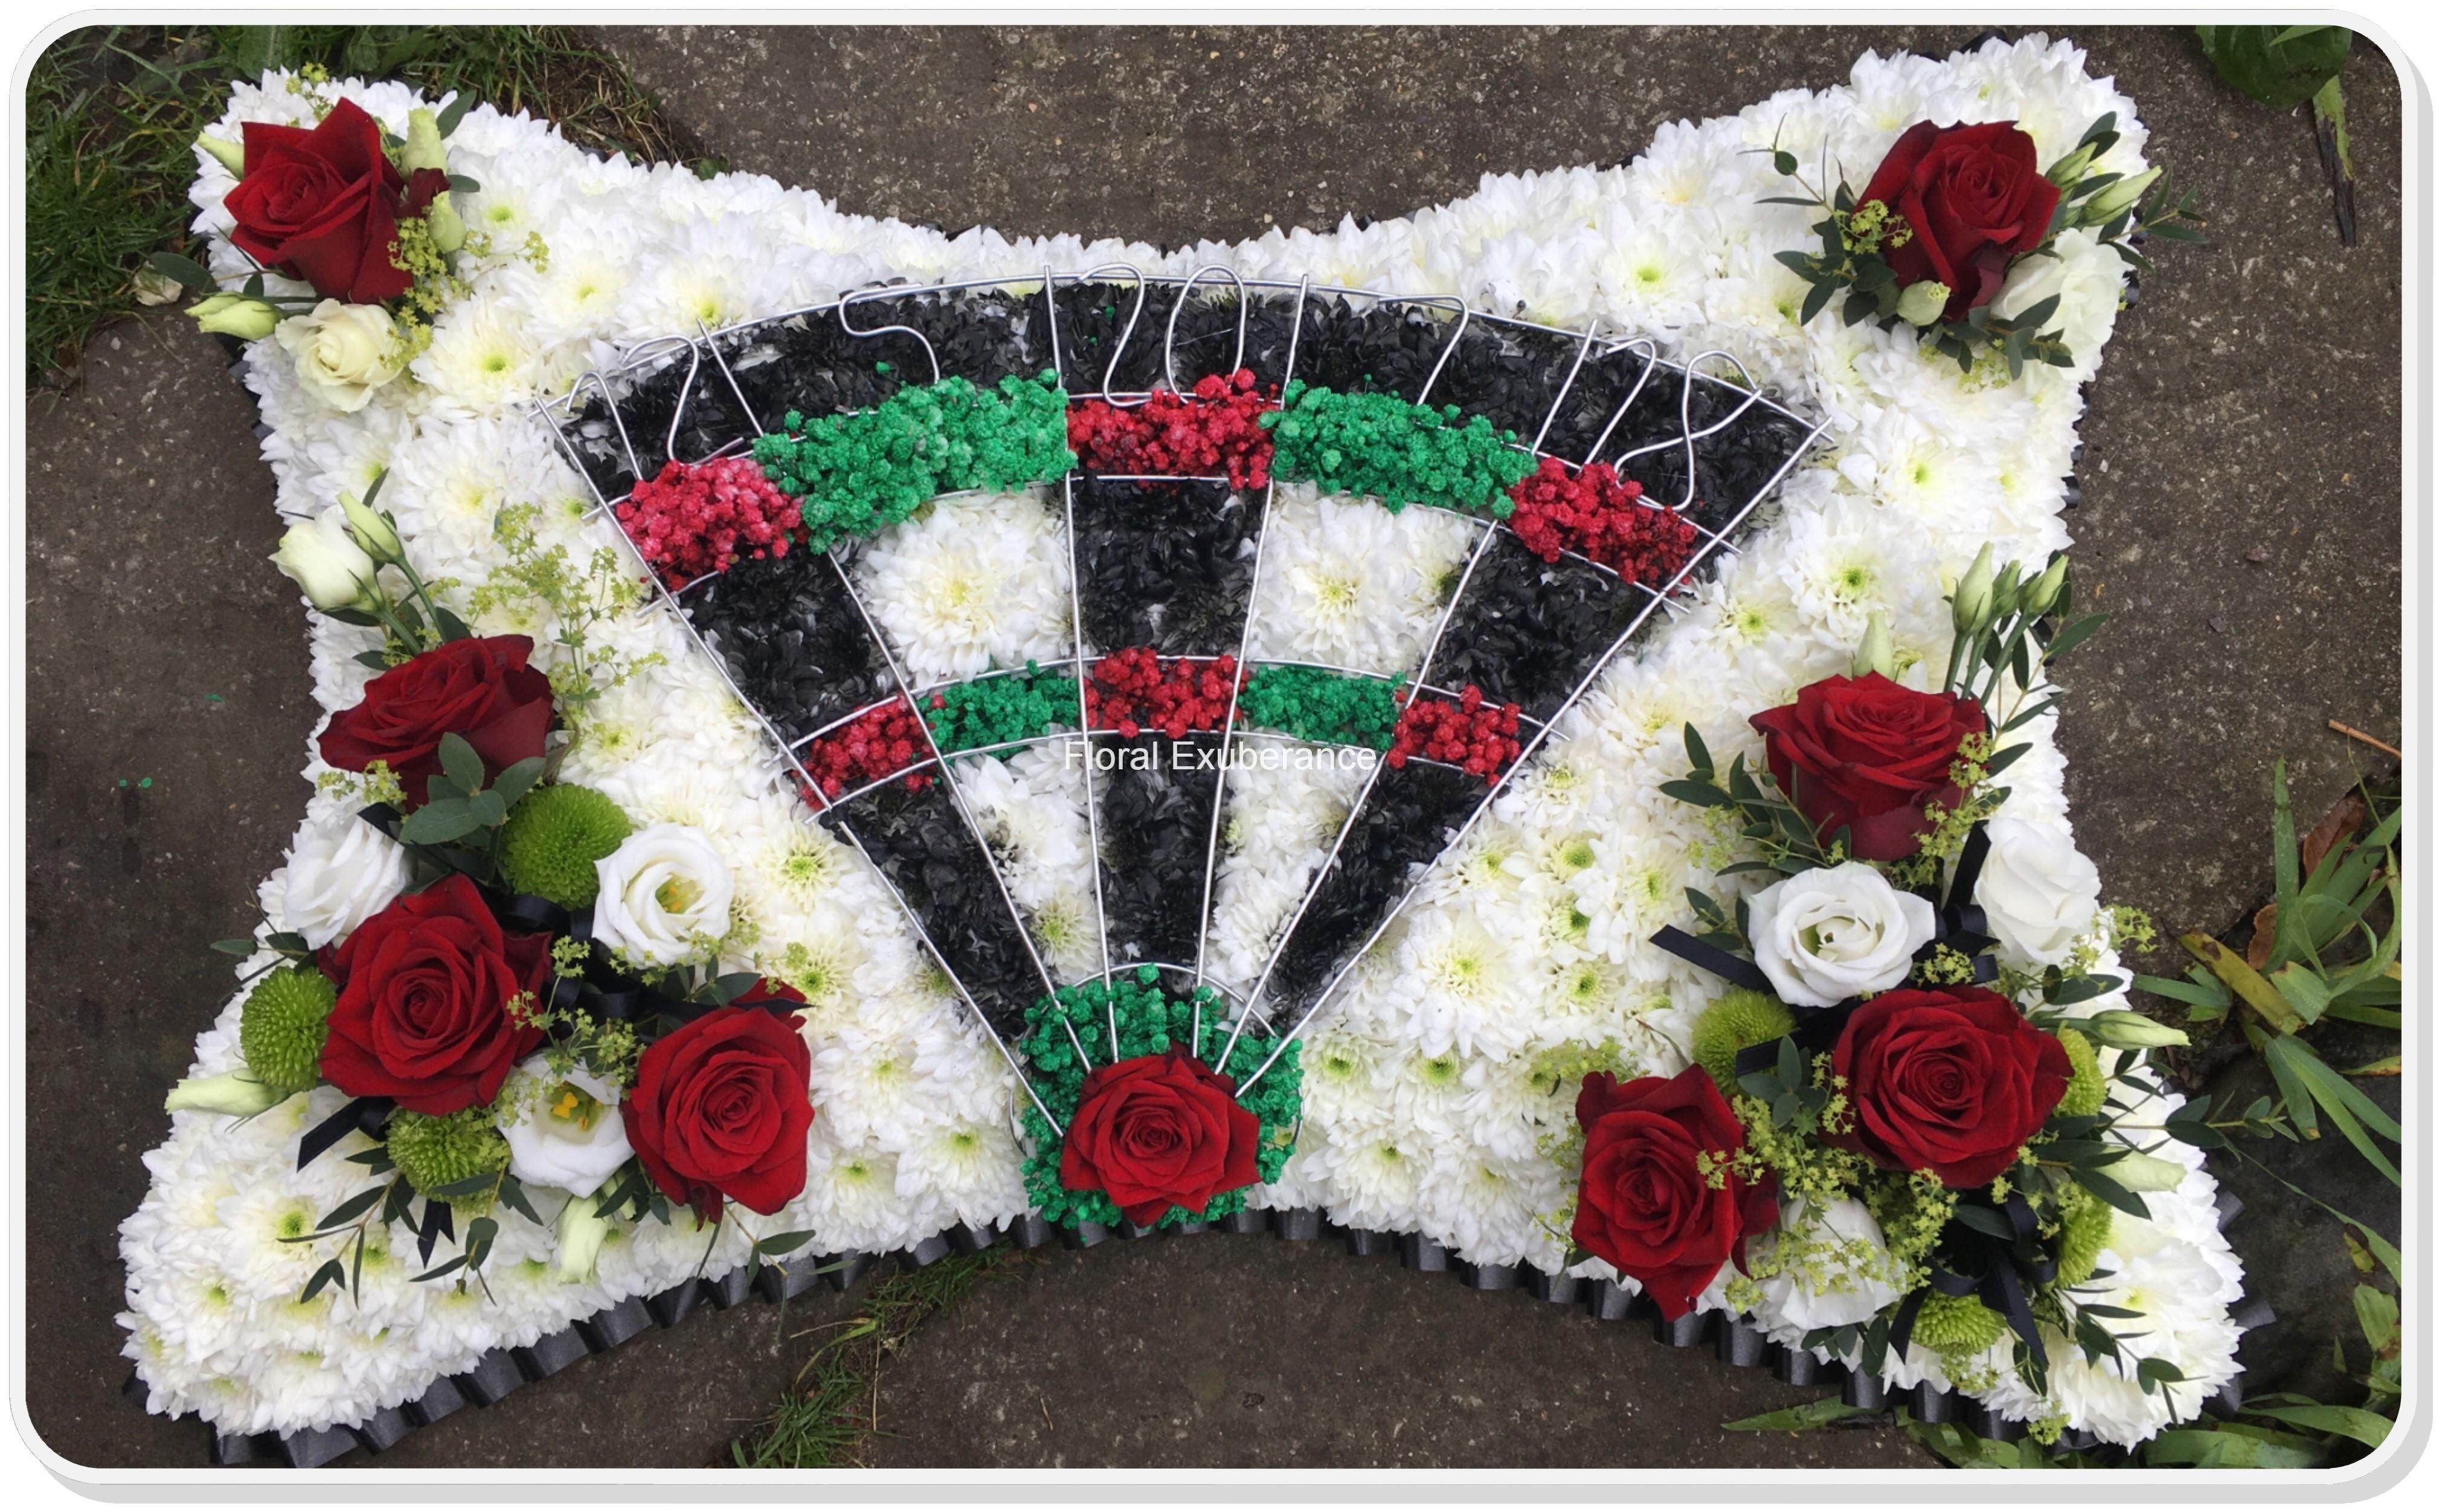 Dartboard funeral flower tribute floral exuberance dartboard funeral flower tribute izmirmasajfo